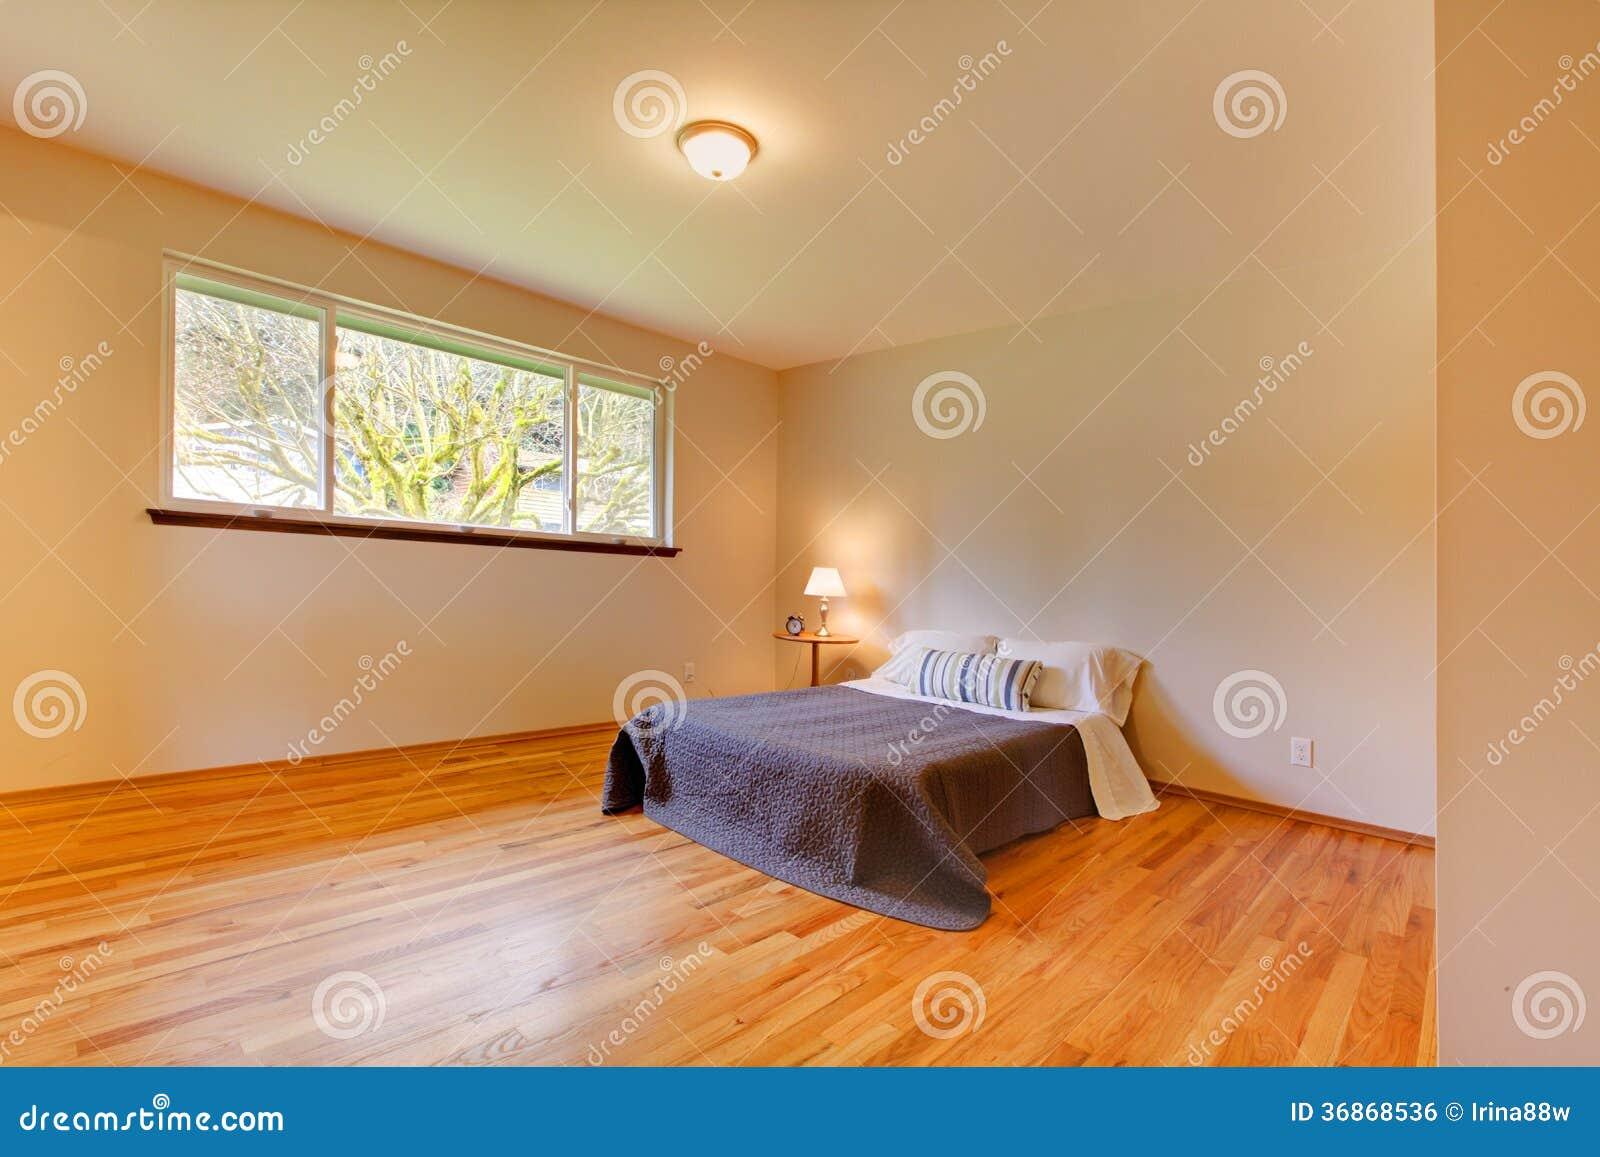 La chambre coucher spacieuse avec la lumi re modifie la for La chambre a coucher